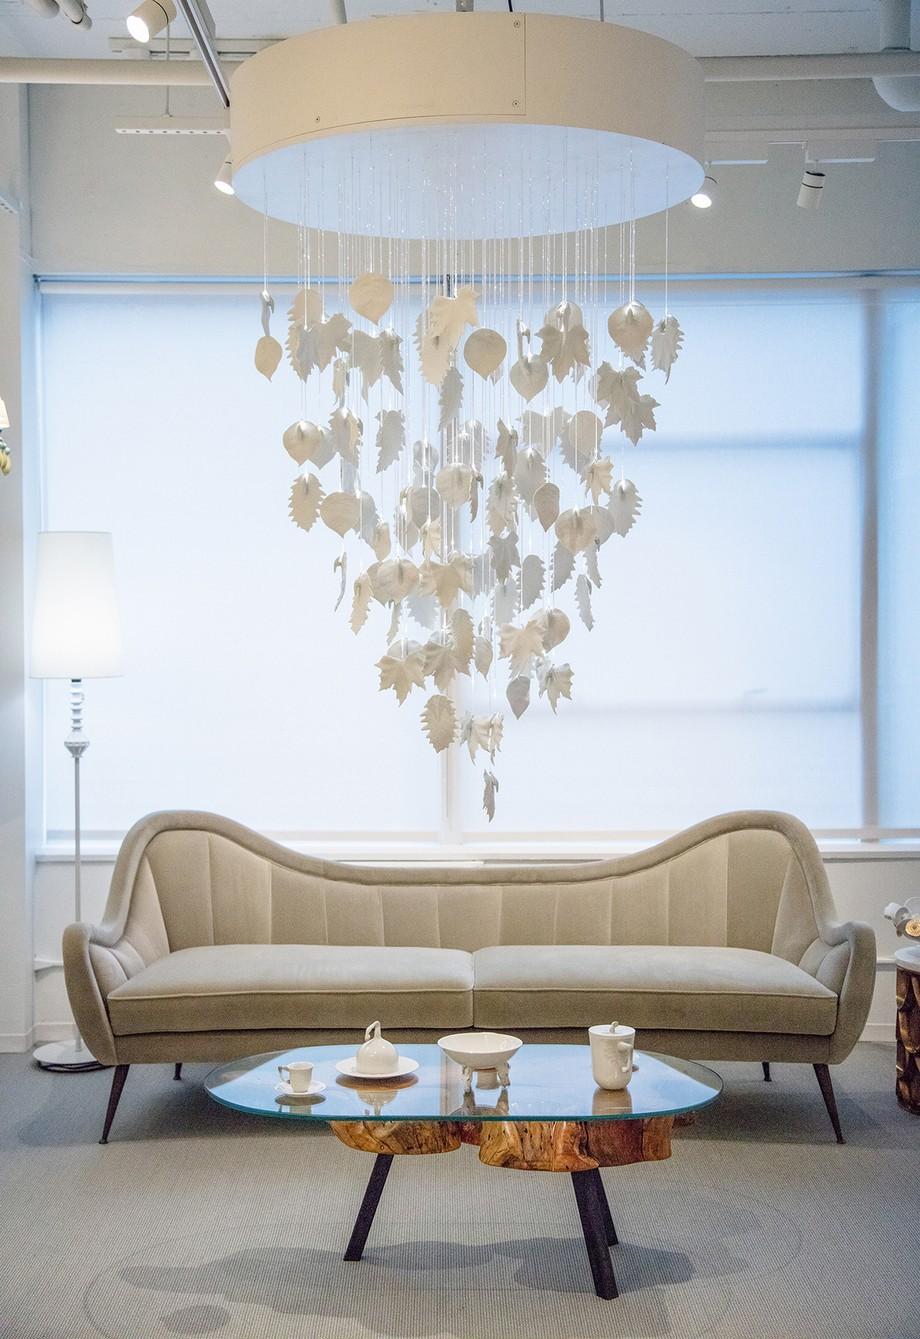 tendencias de diseño de interiores 2018 Tendencias de Diseño de Interiores 2018 para la Decoración de su Hogar Hermes